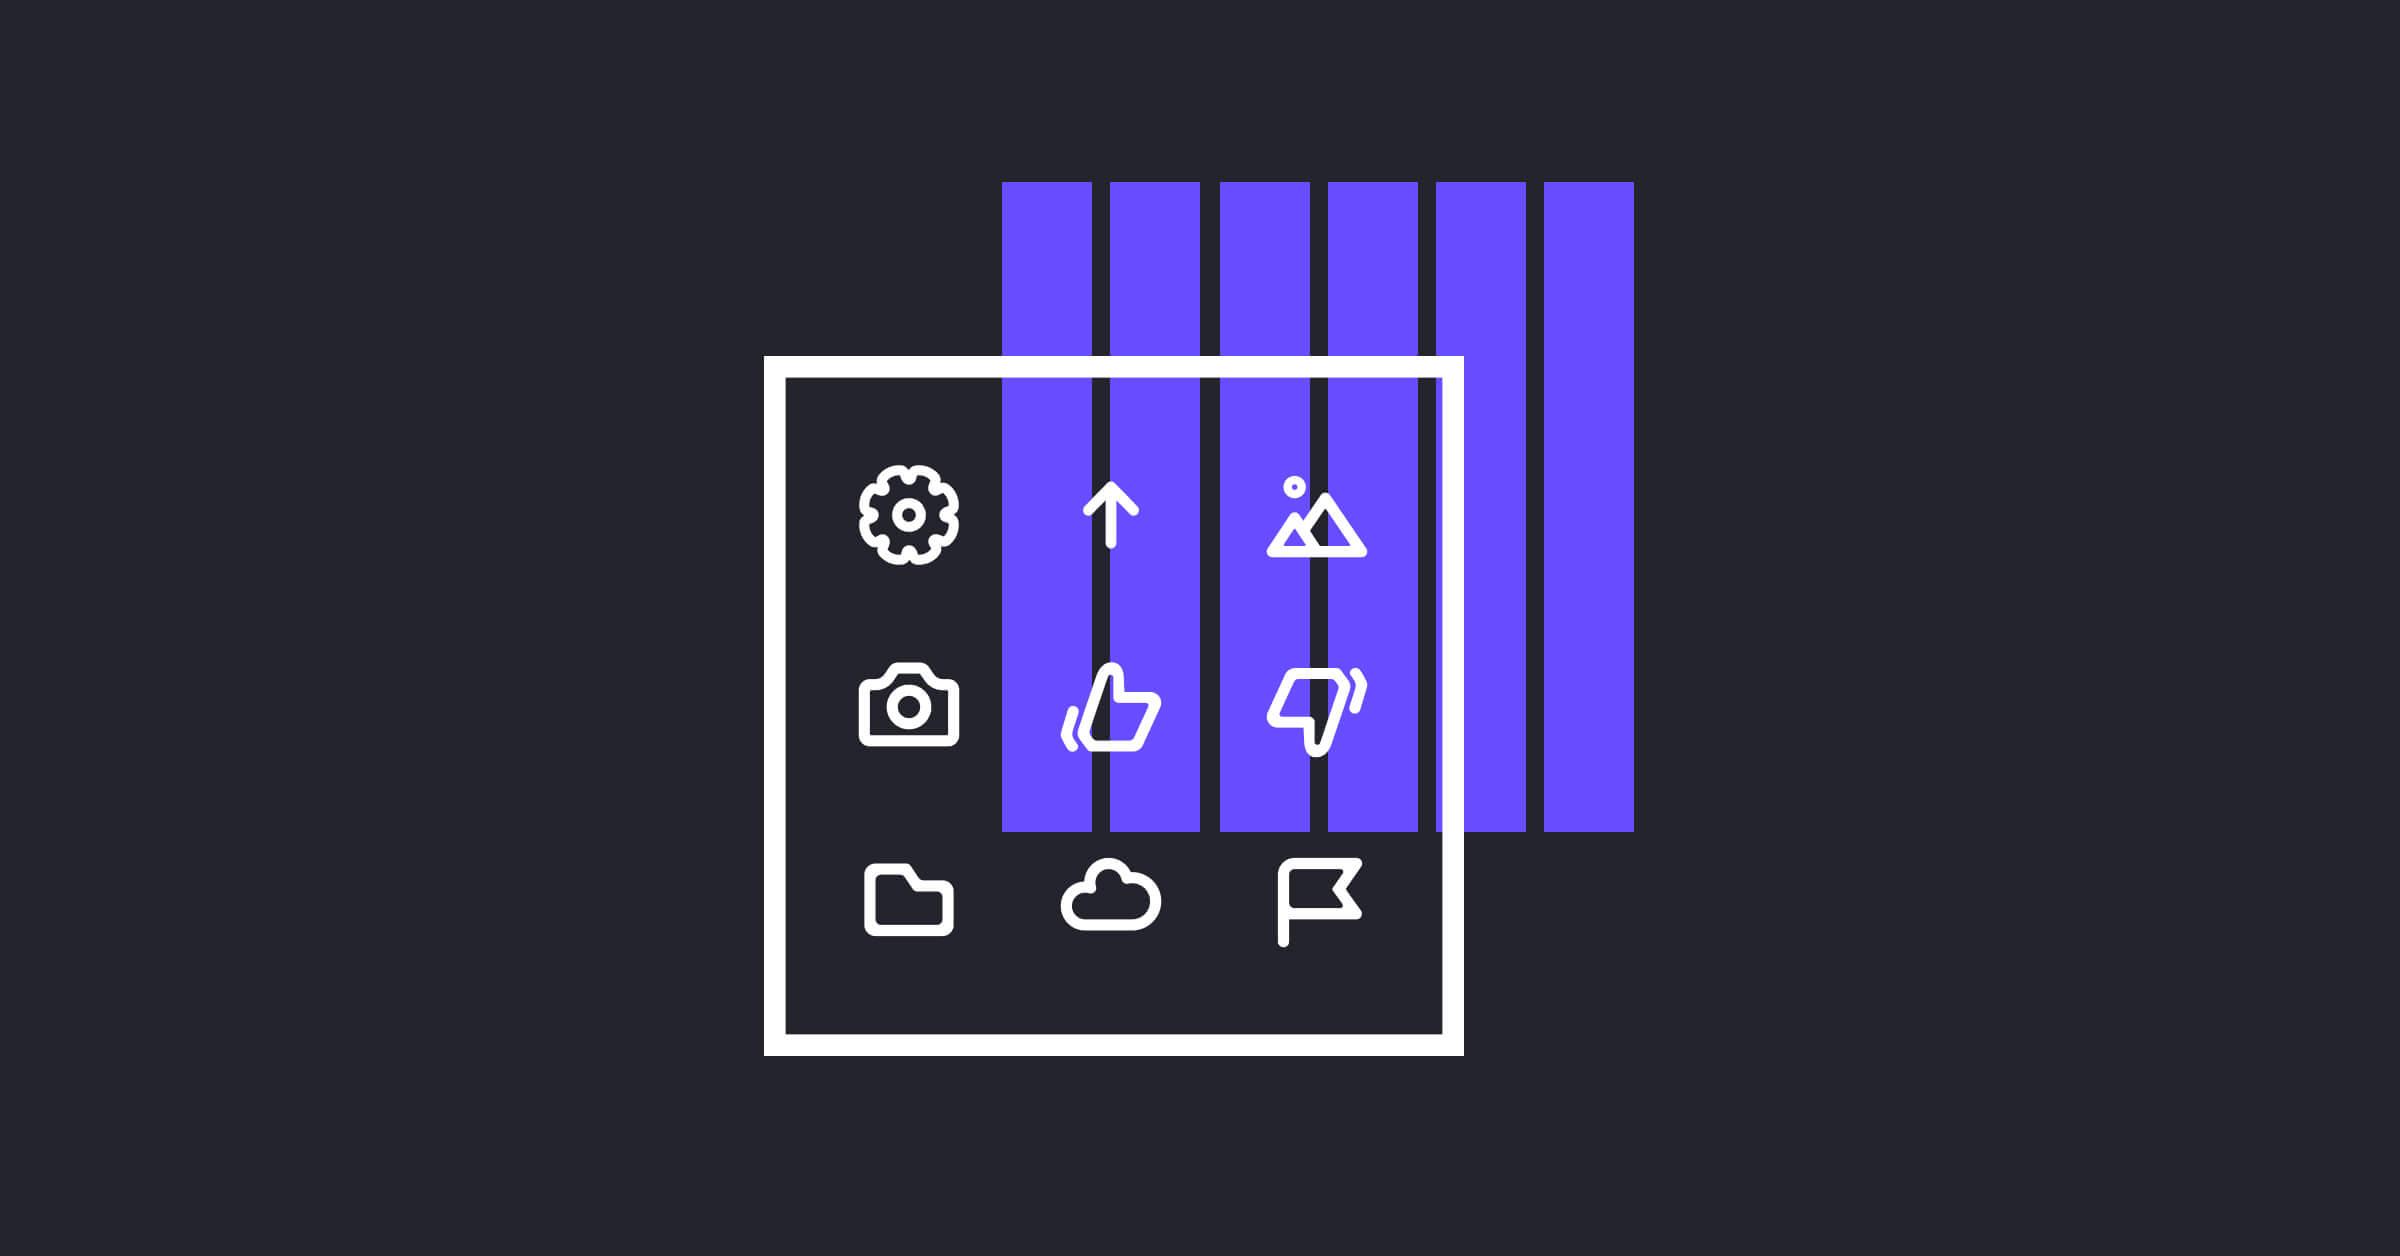 UX/UI Design Deliverables